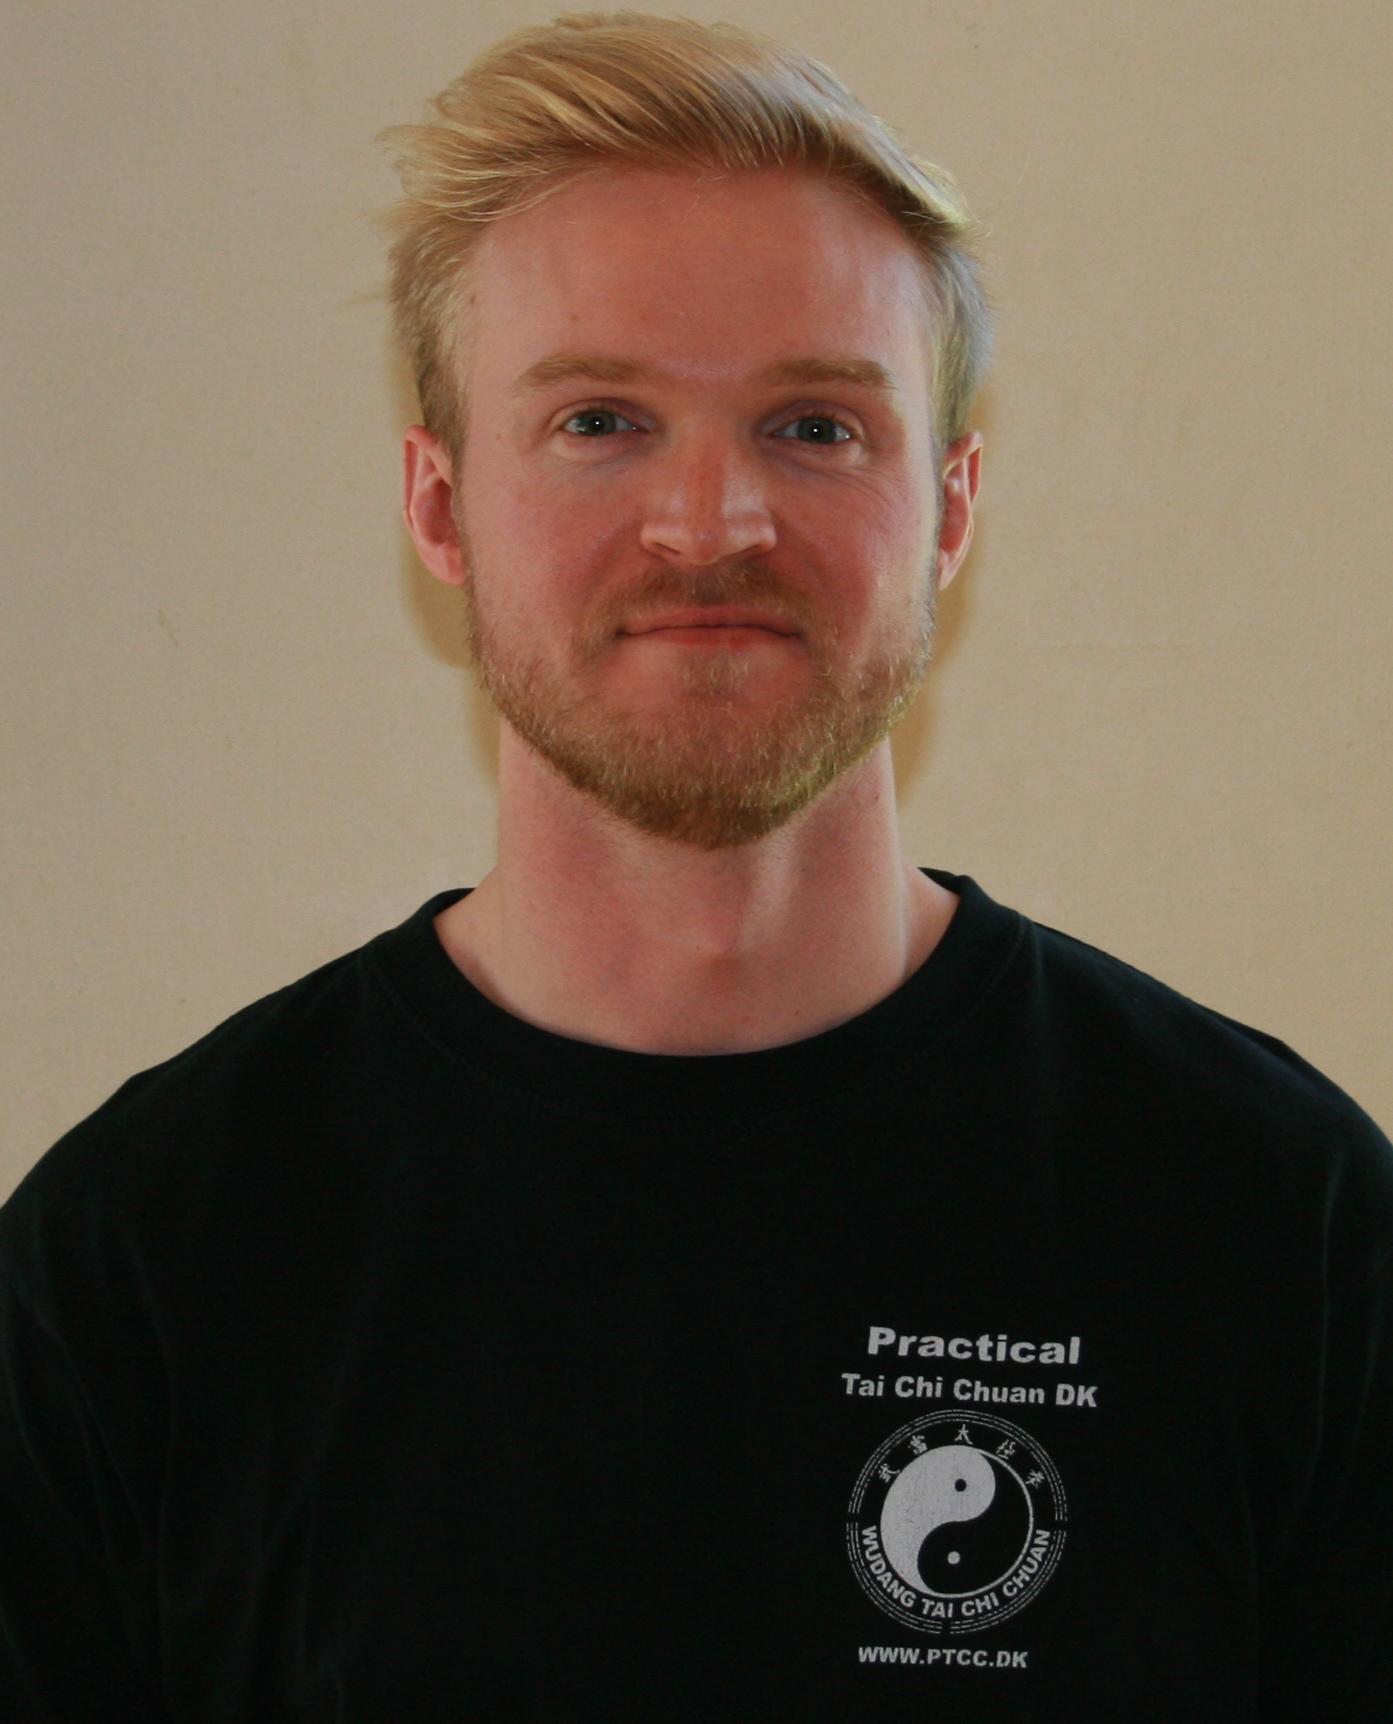 Chefinstruktør Kasper Larsen Praktiseret Tai Chi siden 1993. Instruktørniveau: 5. Internationale resultater - IMG_2402